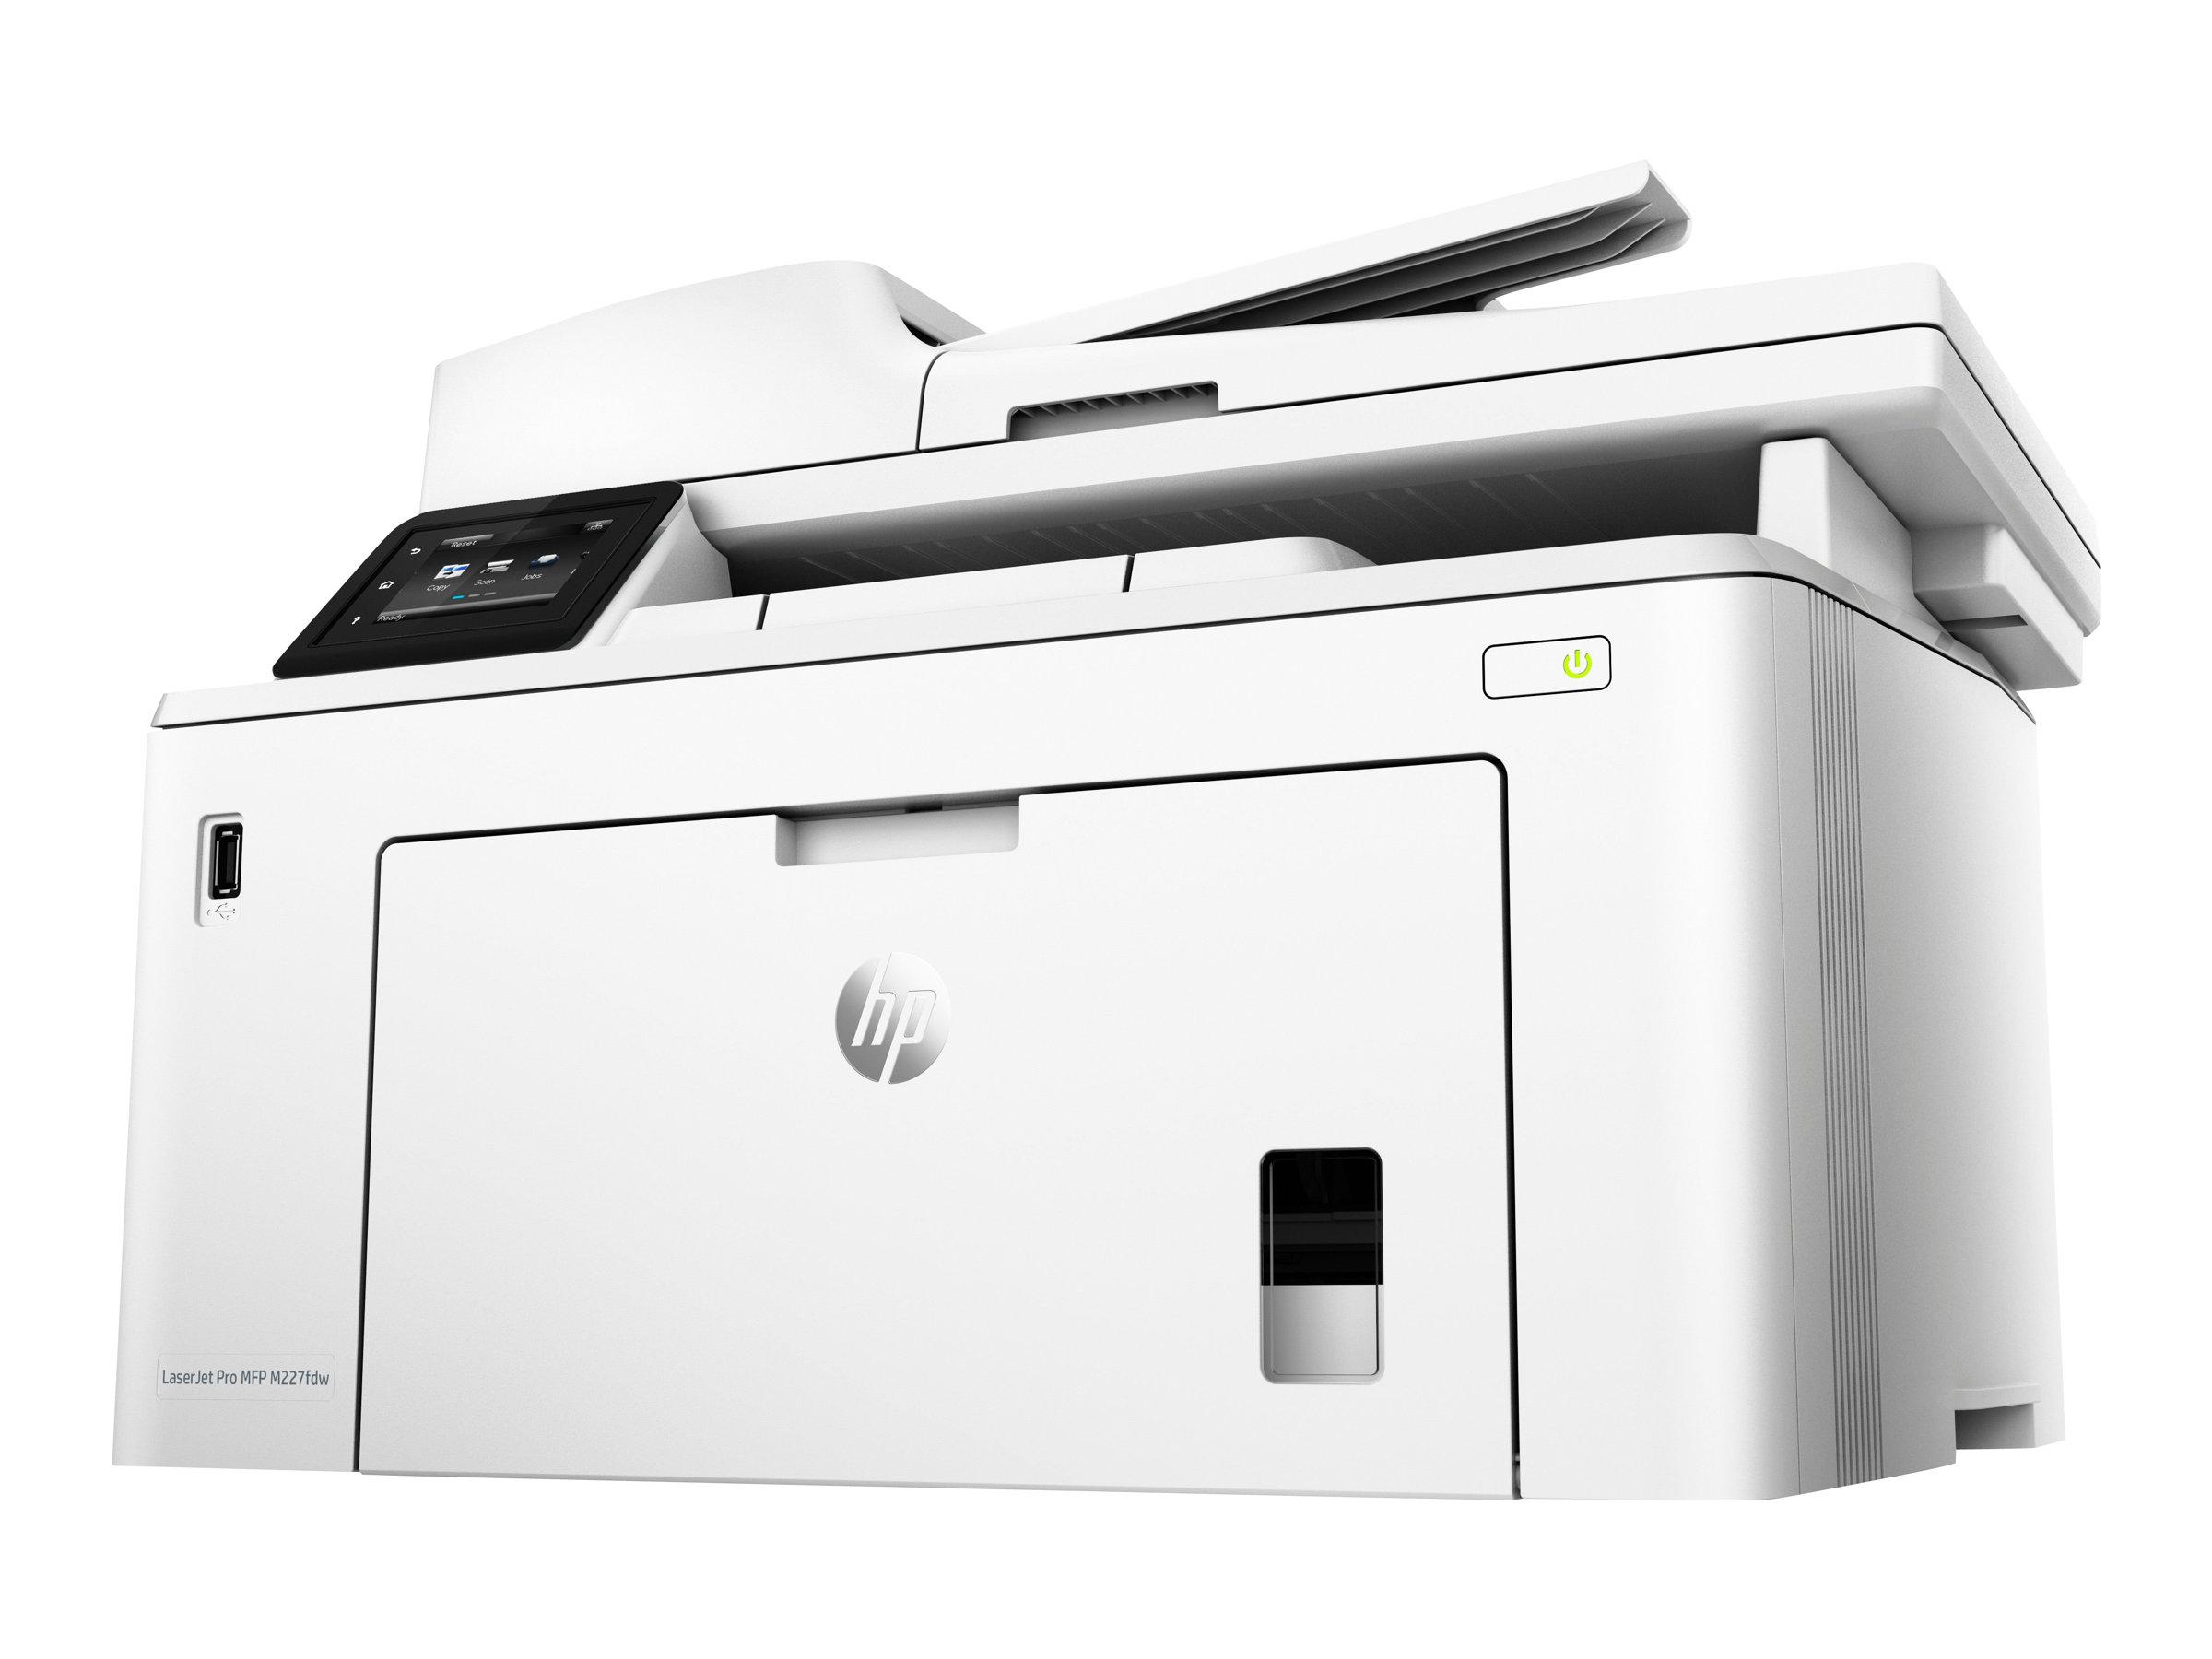 HP LaserJet Pro MFP M227fdw - imprimante laser multifonction monochrome A4 - recto-verso - Wifi